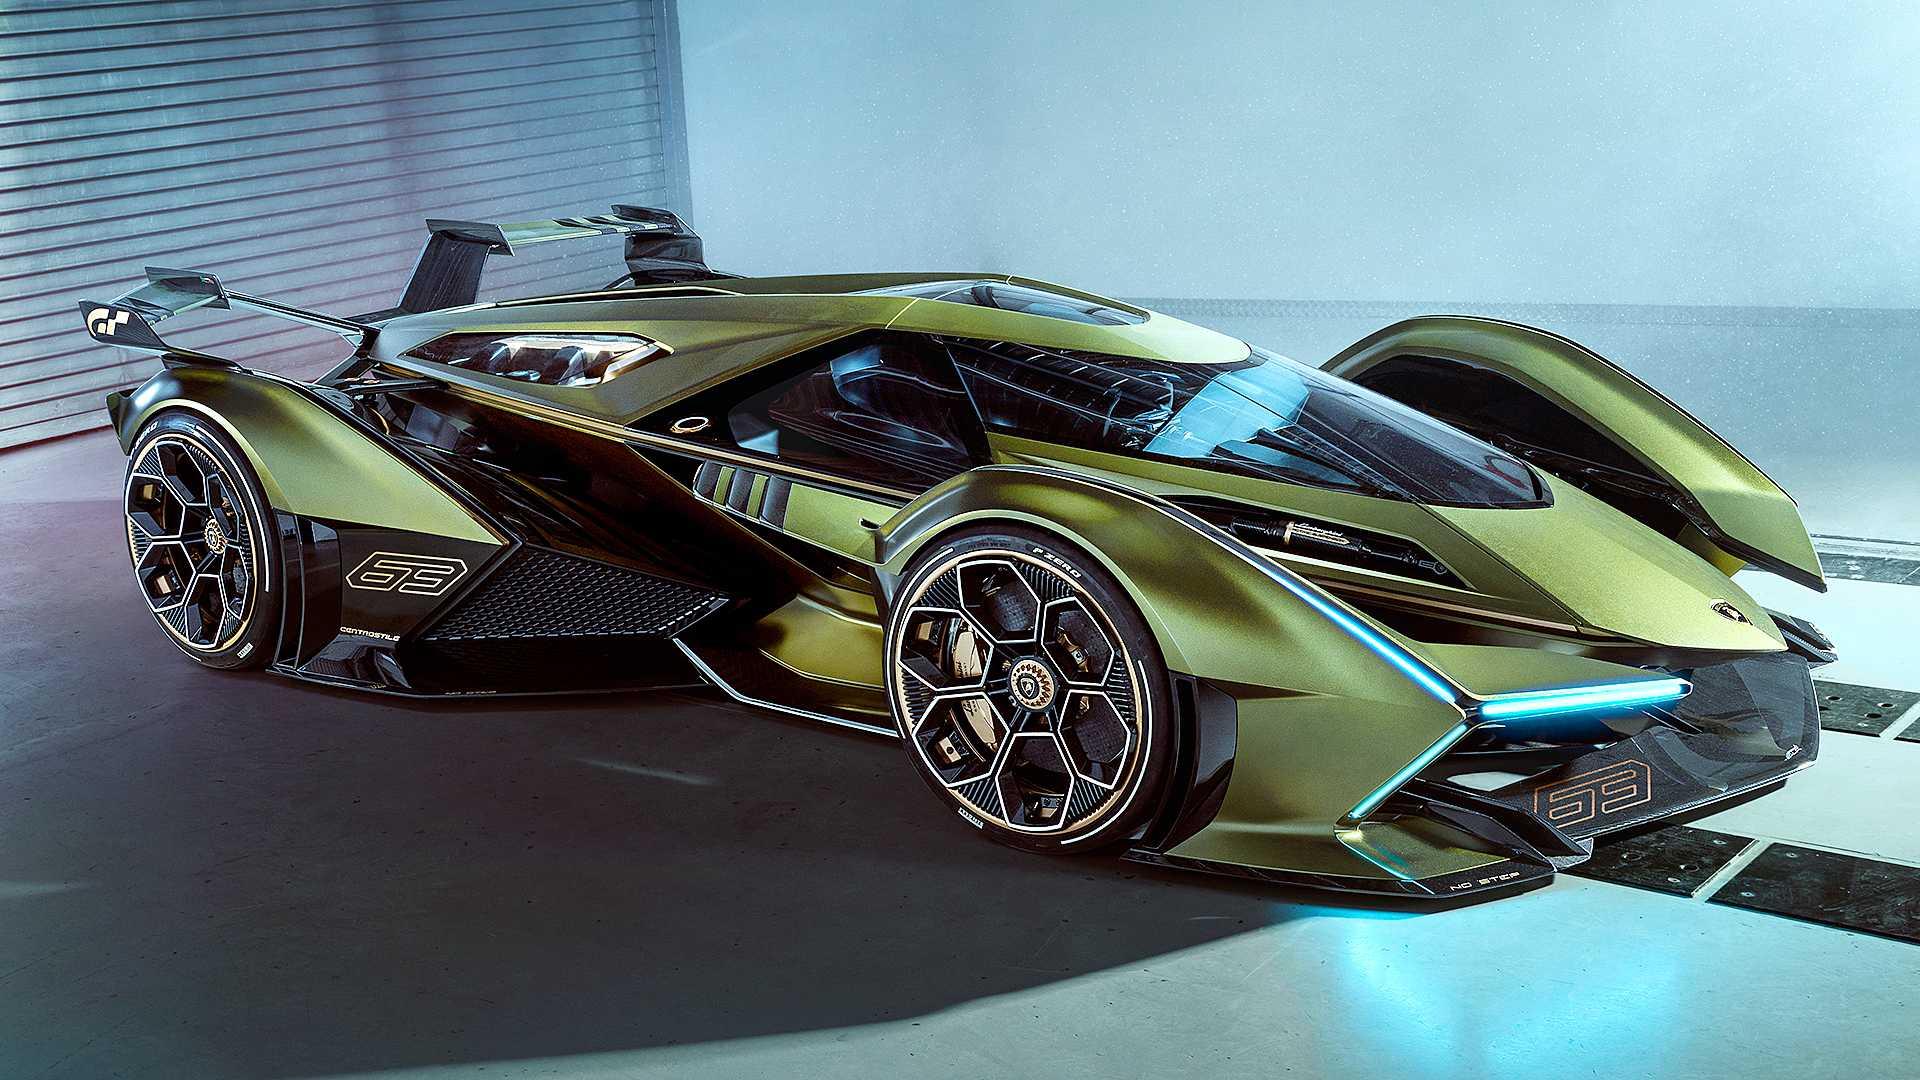 Lamborghini-V12-Vision-Gran-Turismo-7